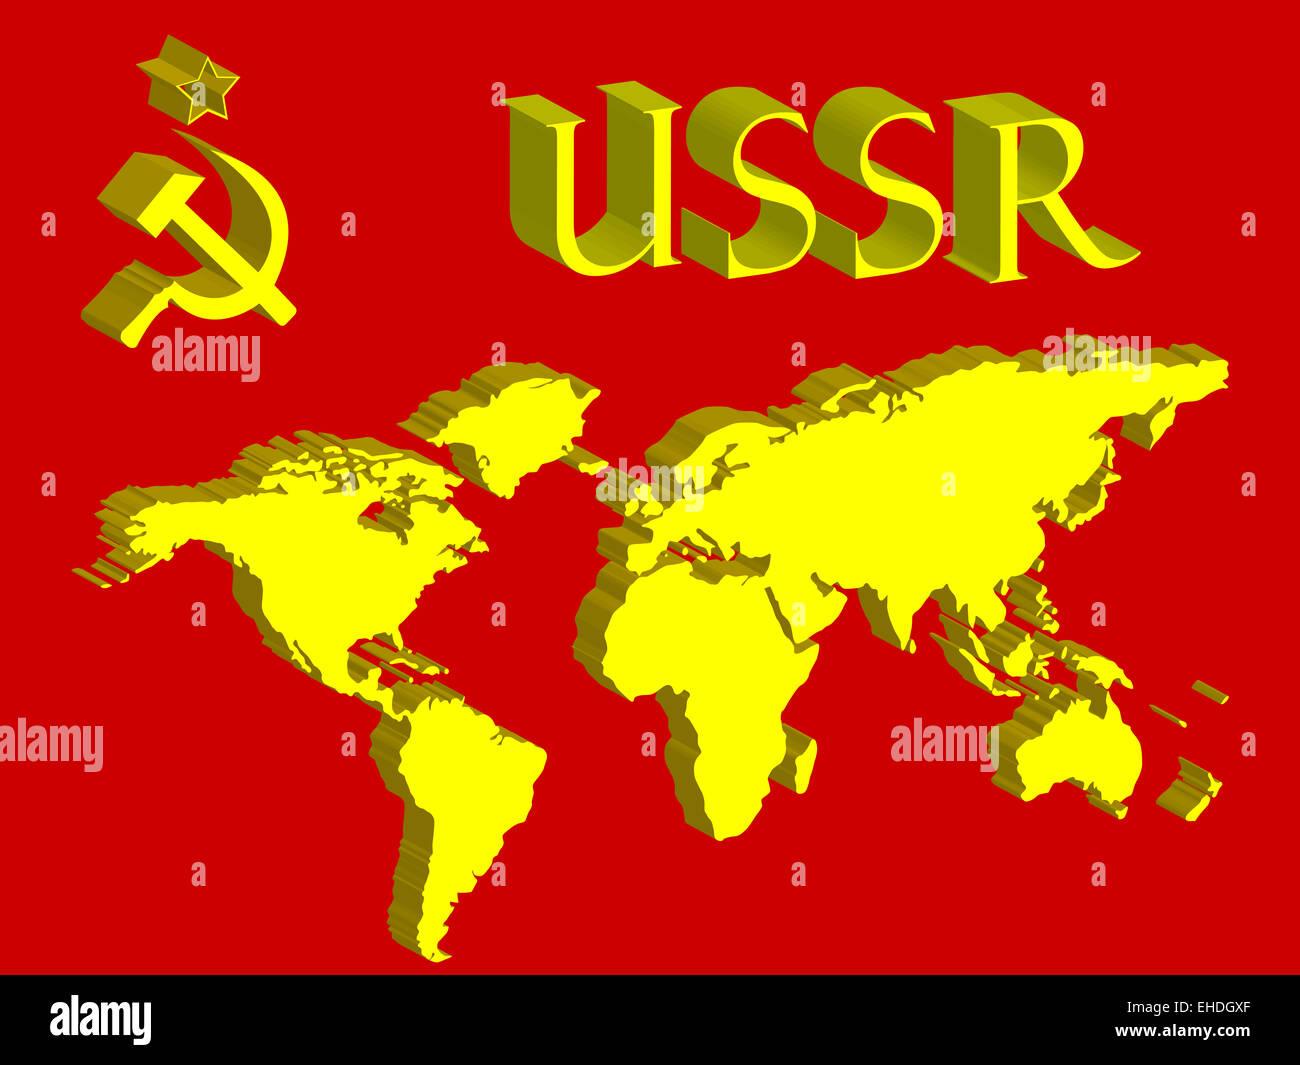 Ussr symbol and world map stock photo 79589287 alamy ussr symbol and world map gumiabroncs Image collections